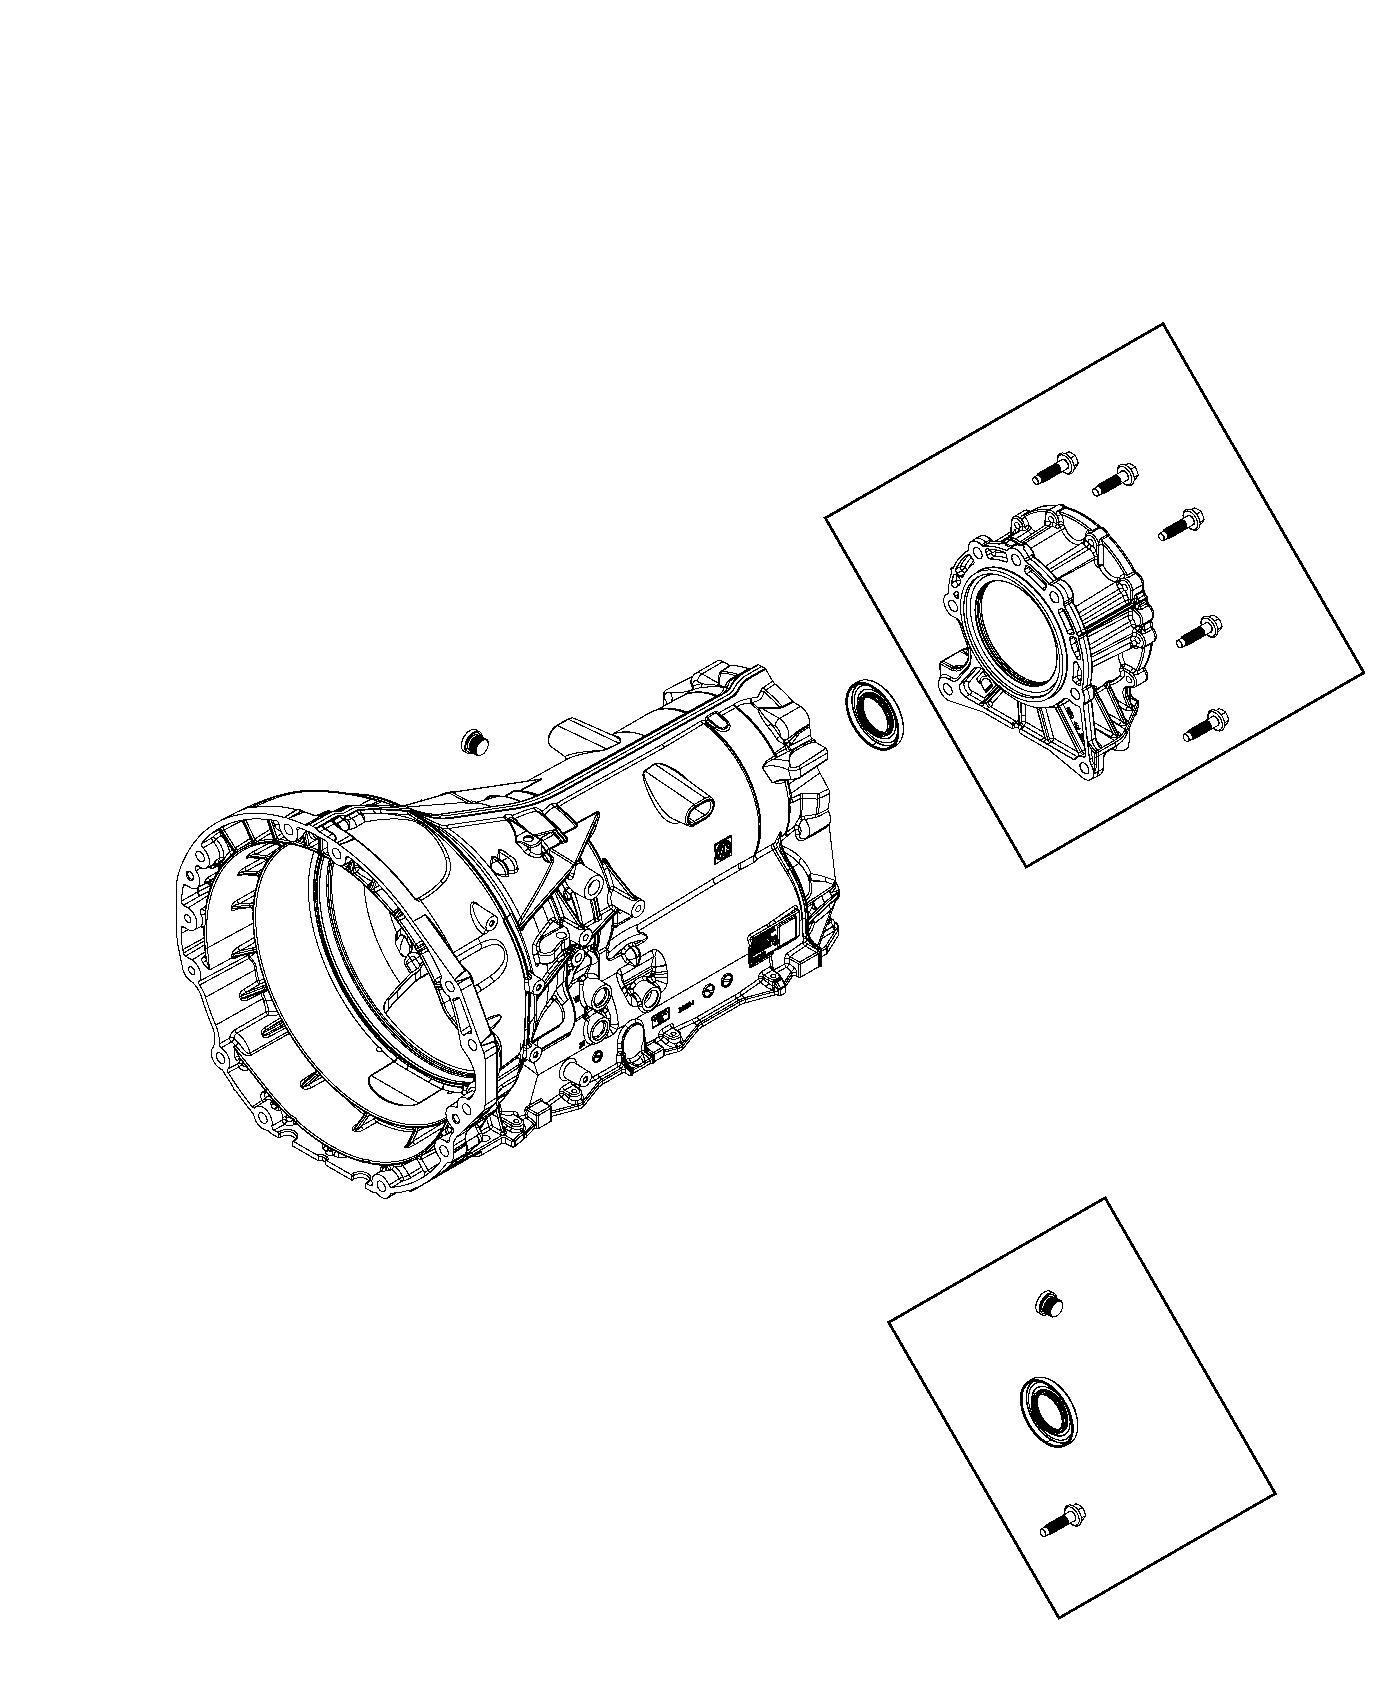 Dodge Ram Adapter Transfer Case Rear Ratio Axle